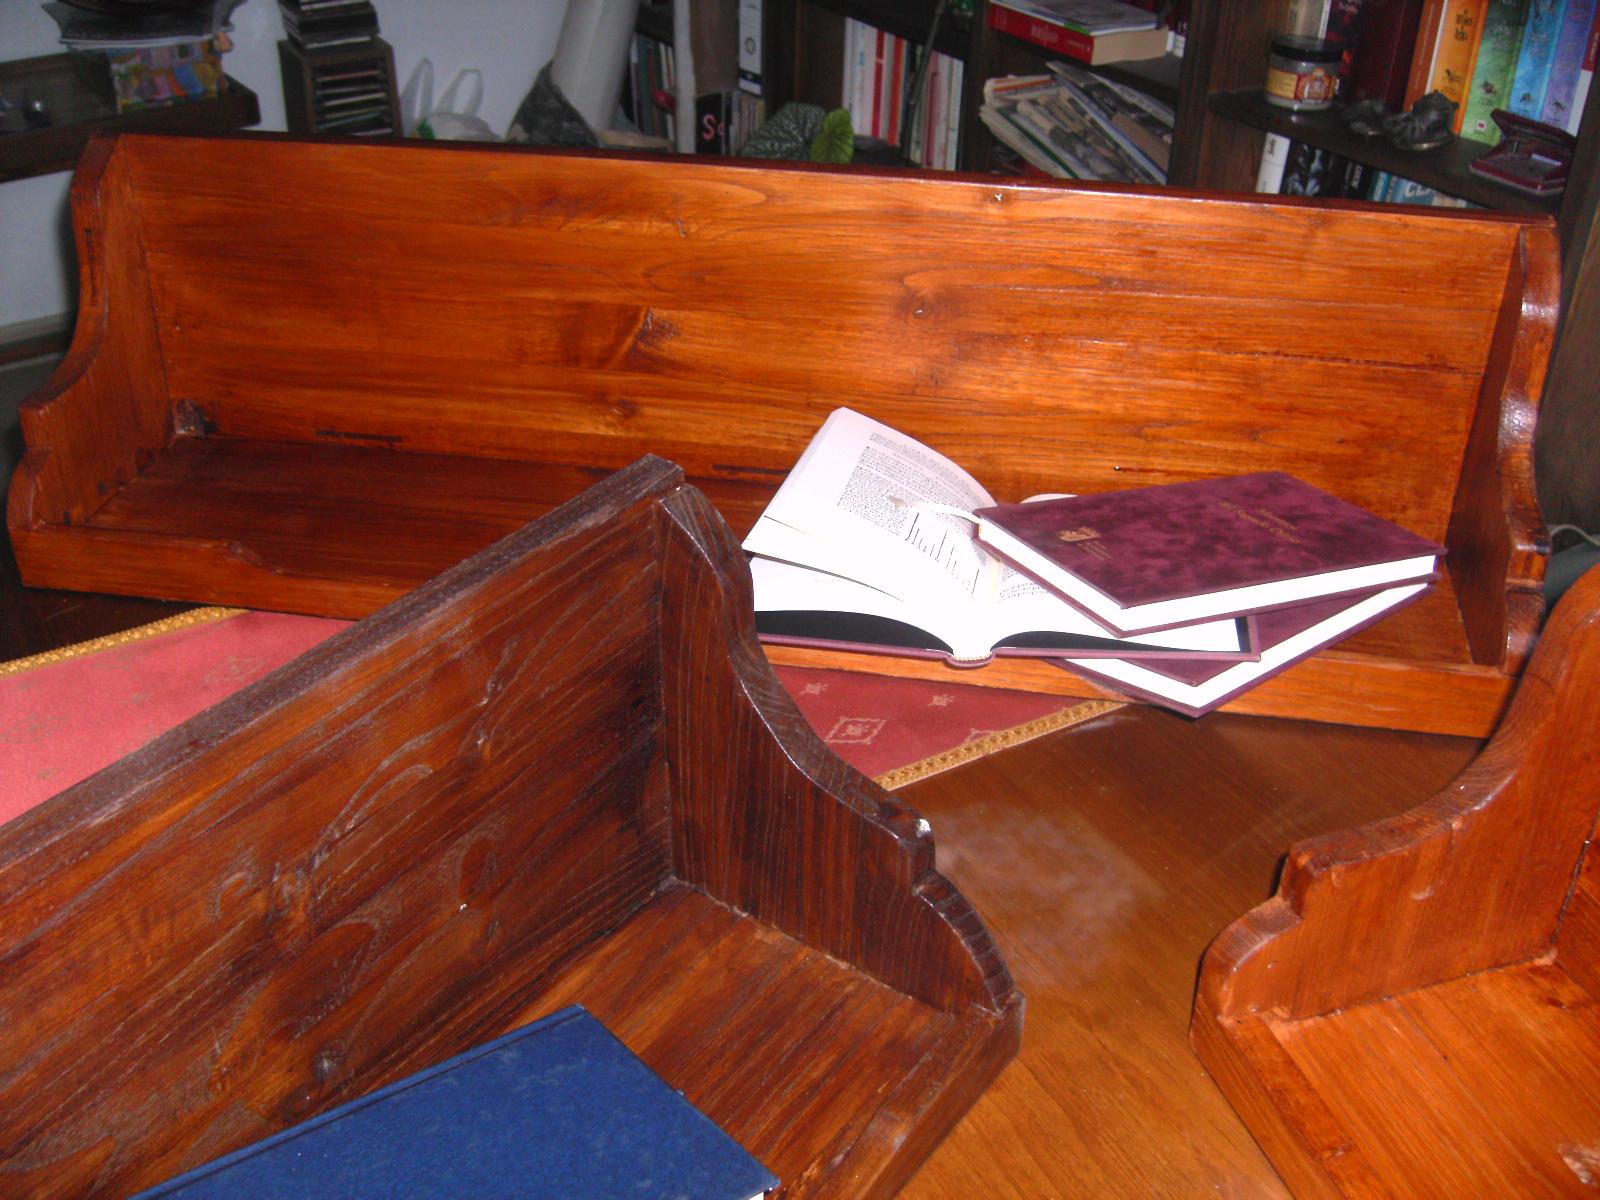 Lavadero de madera original estanter a para libros for Diseno lavadero